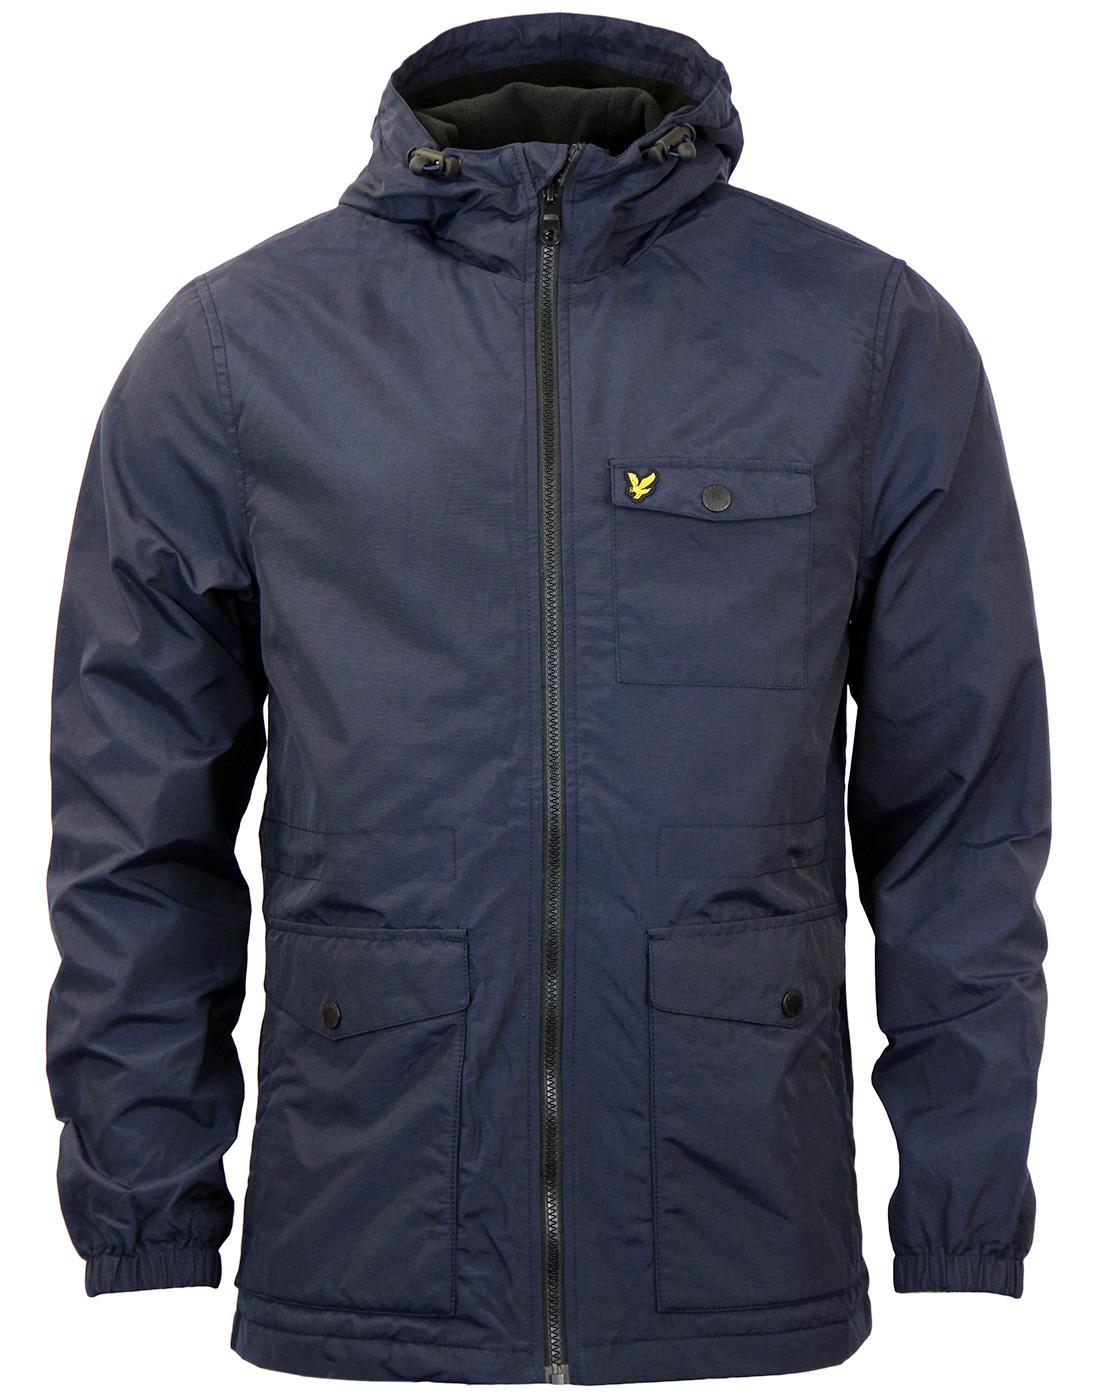 lyle scott microfleece lined mod casual parka jacket in navy. Black Bedroom Furniture Sets. Home Design Ideas